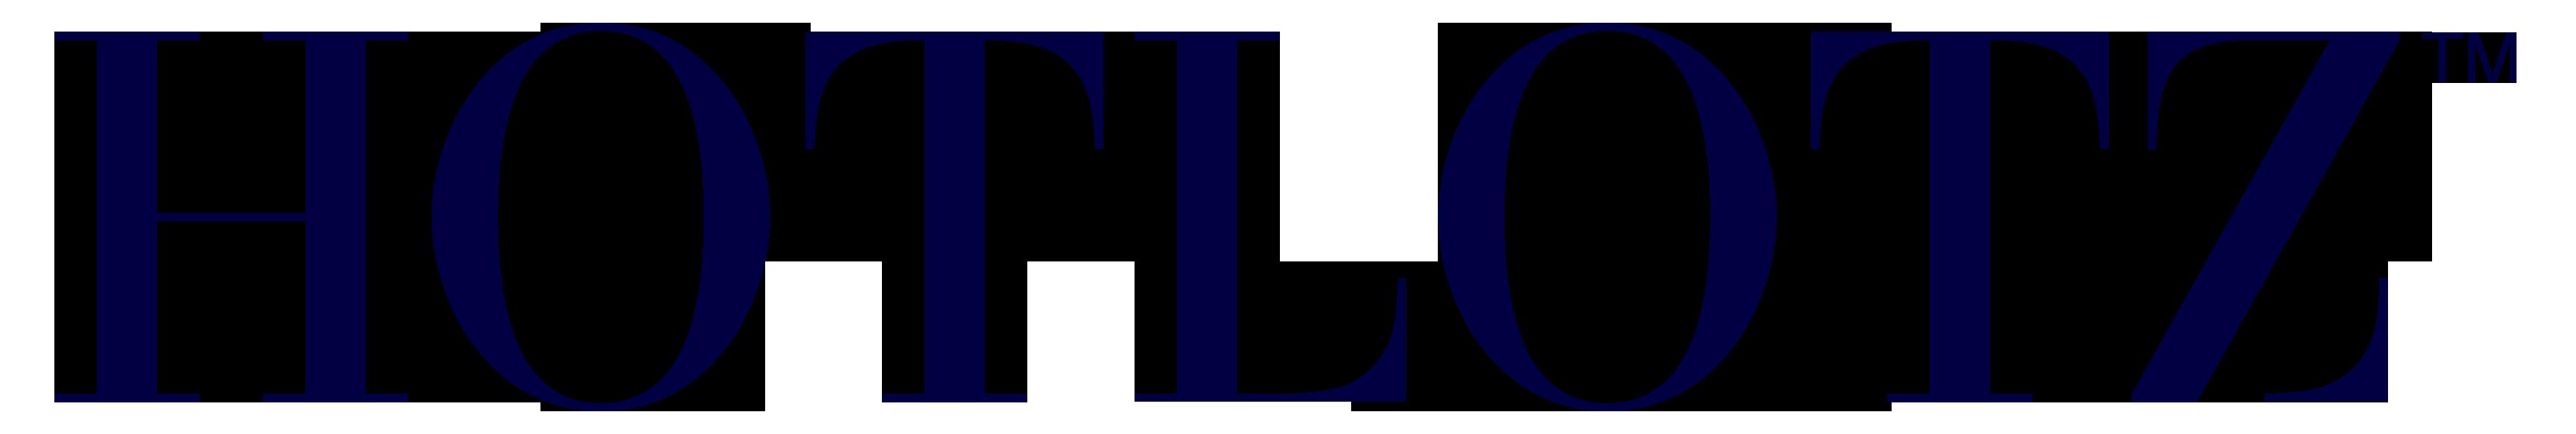 Hotlotz logo